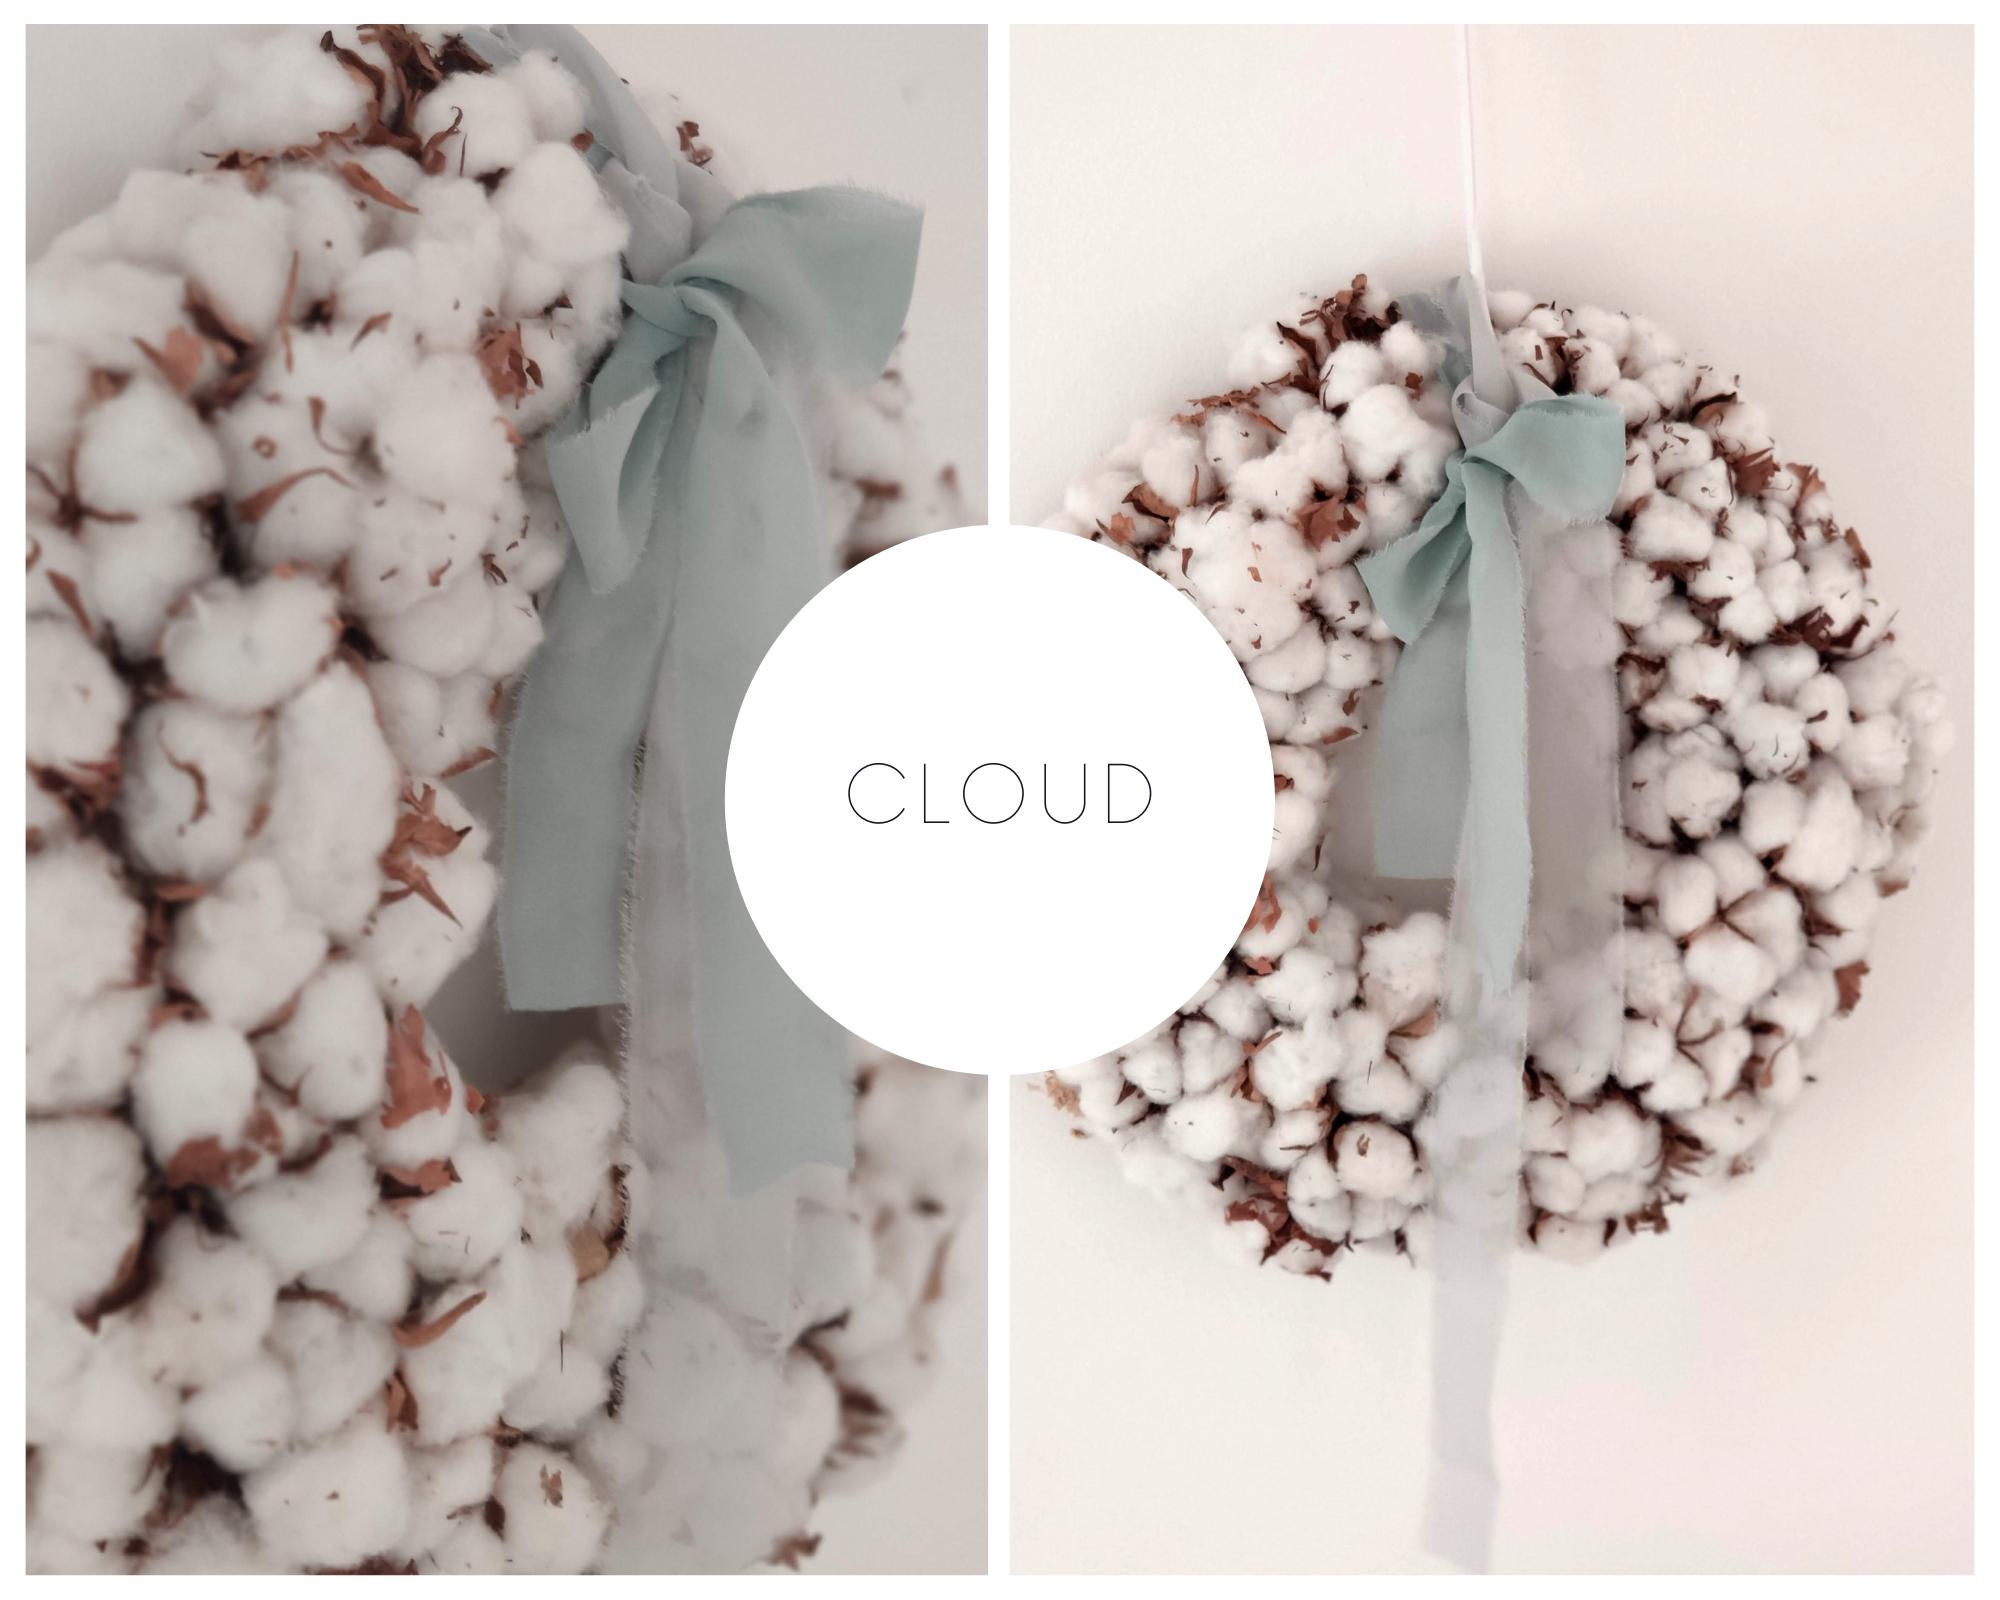 cloud-laurorafloreale.it